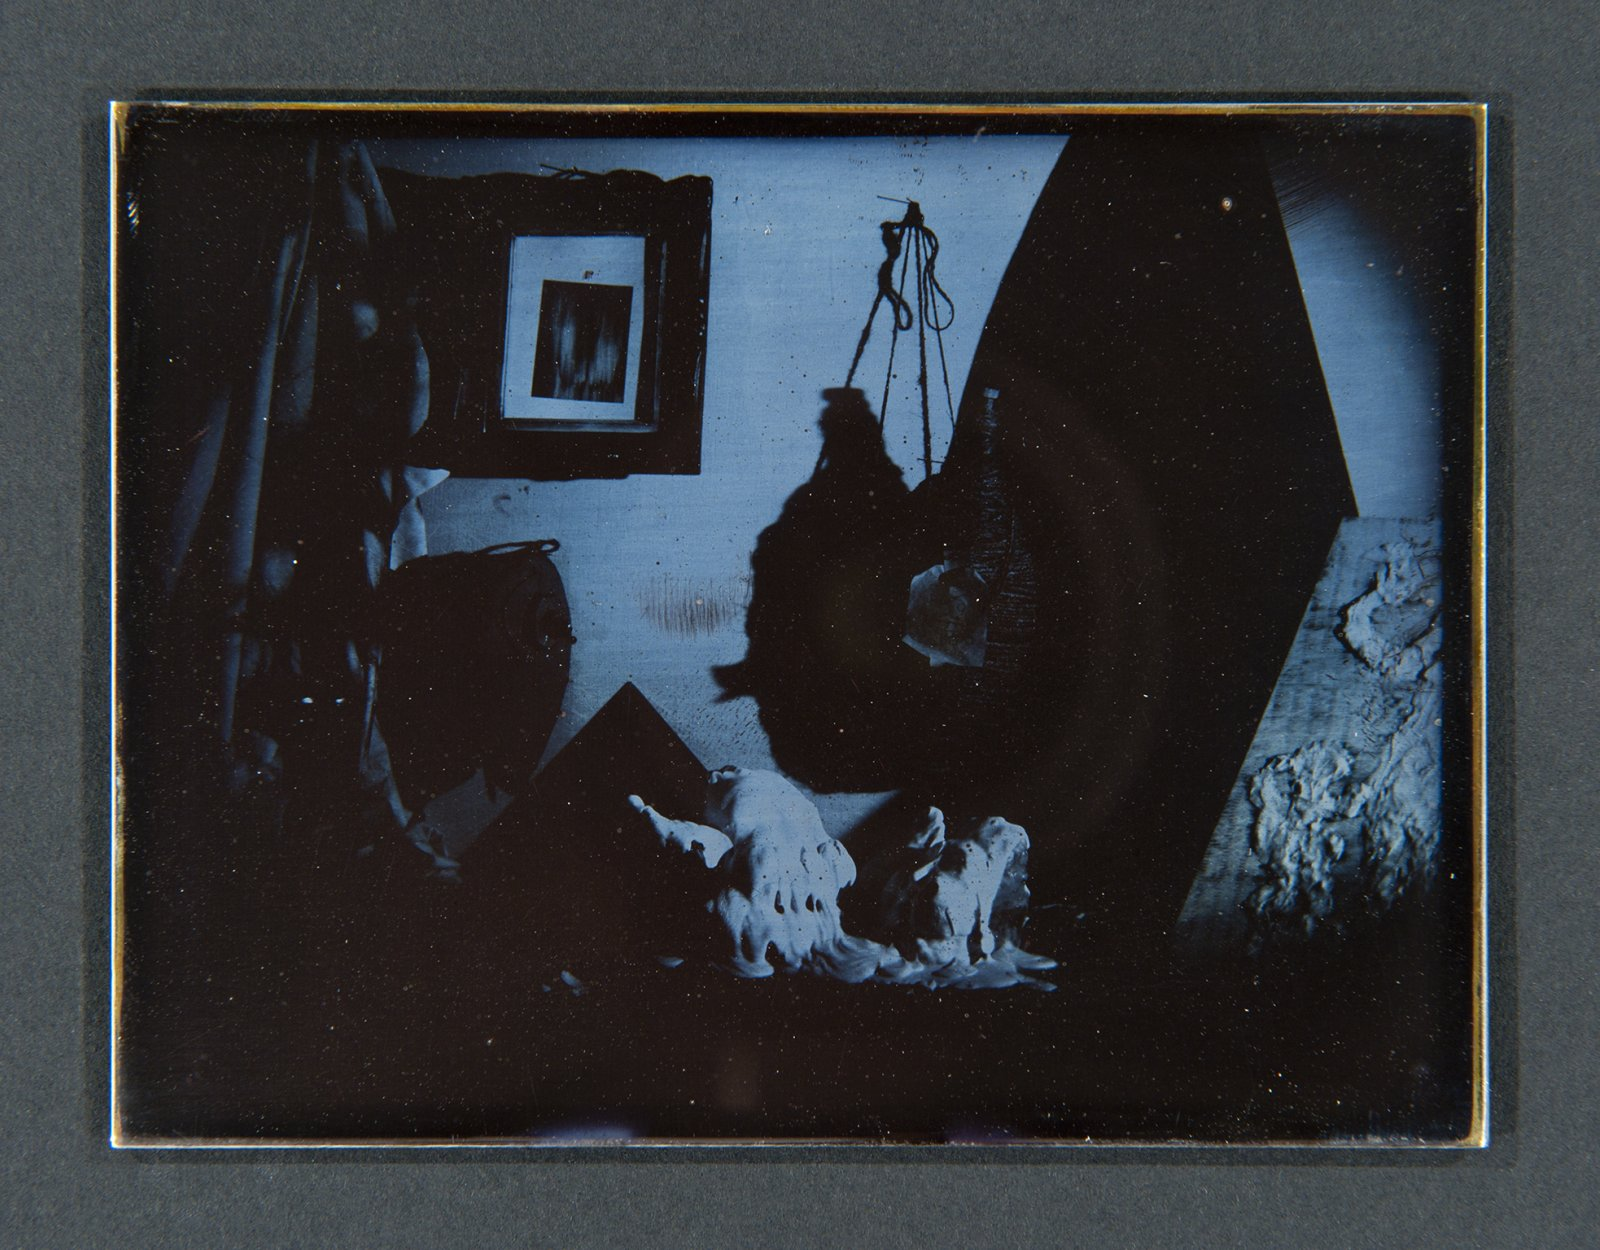 Julia Feyrer, Studio 1, 2 & 3 from The artist's studio (detail), 2010, Becquerel Daguerreotypes on silver coated brass, 7 x 21 x 2 in. (19 x 54 x 2 cm), each daguerreotype: 3 x 4 in. (9 x 11 cm) by Julia Feyrer